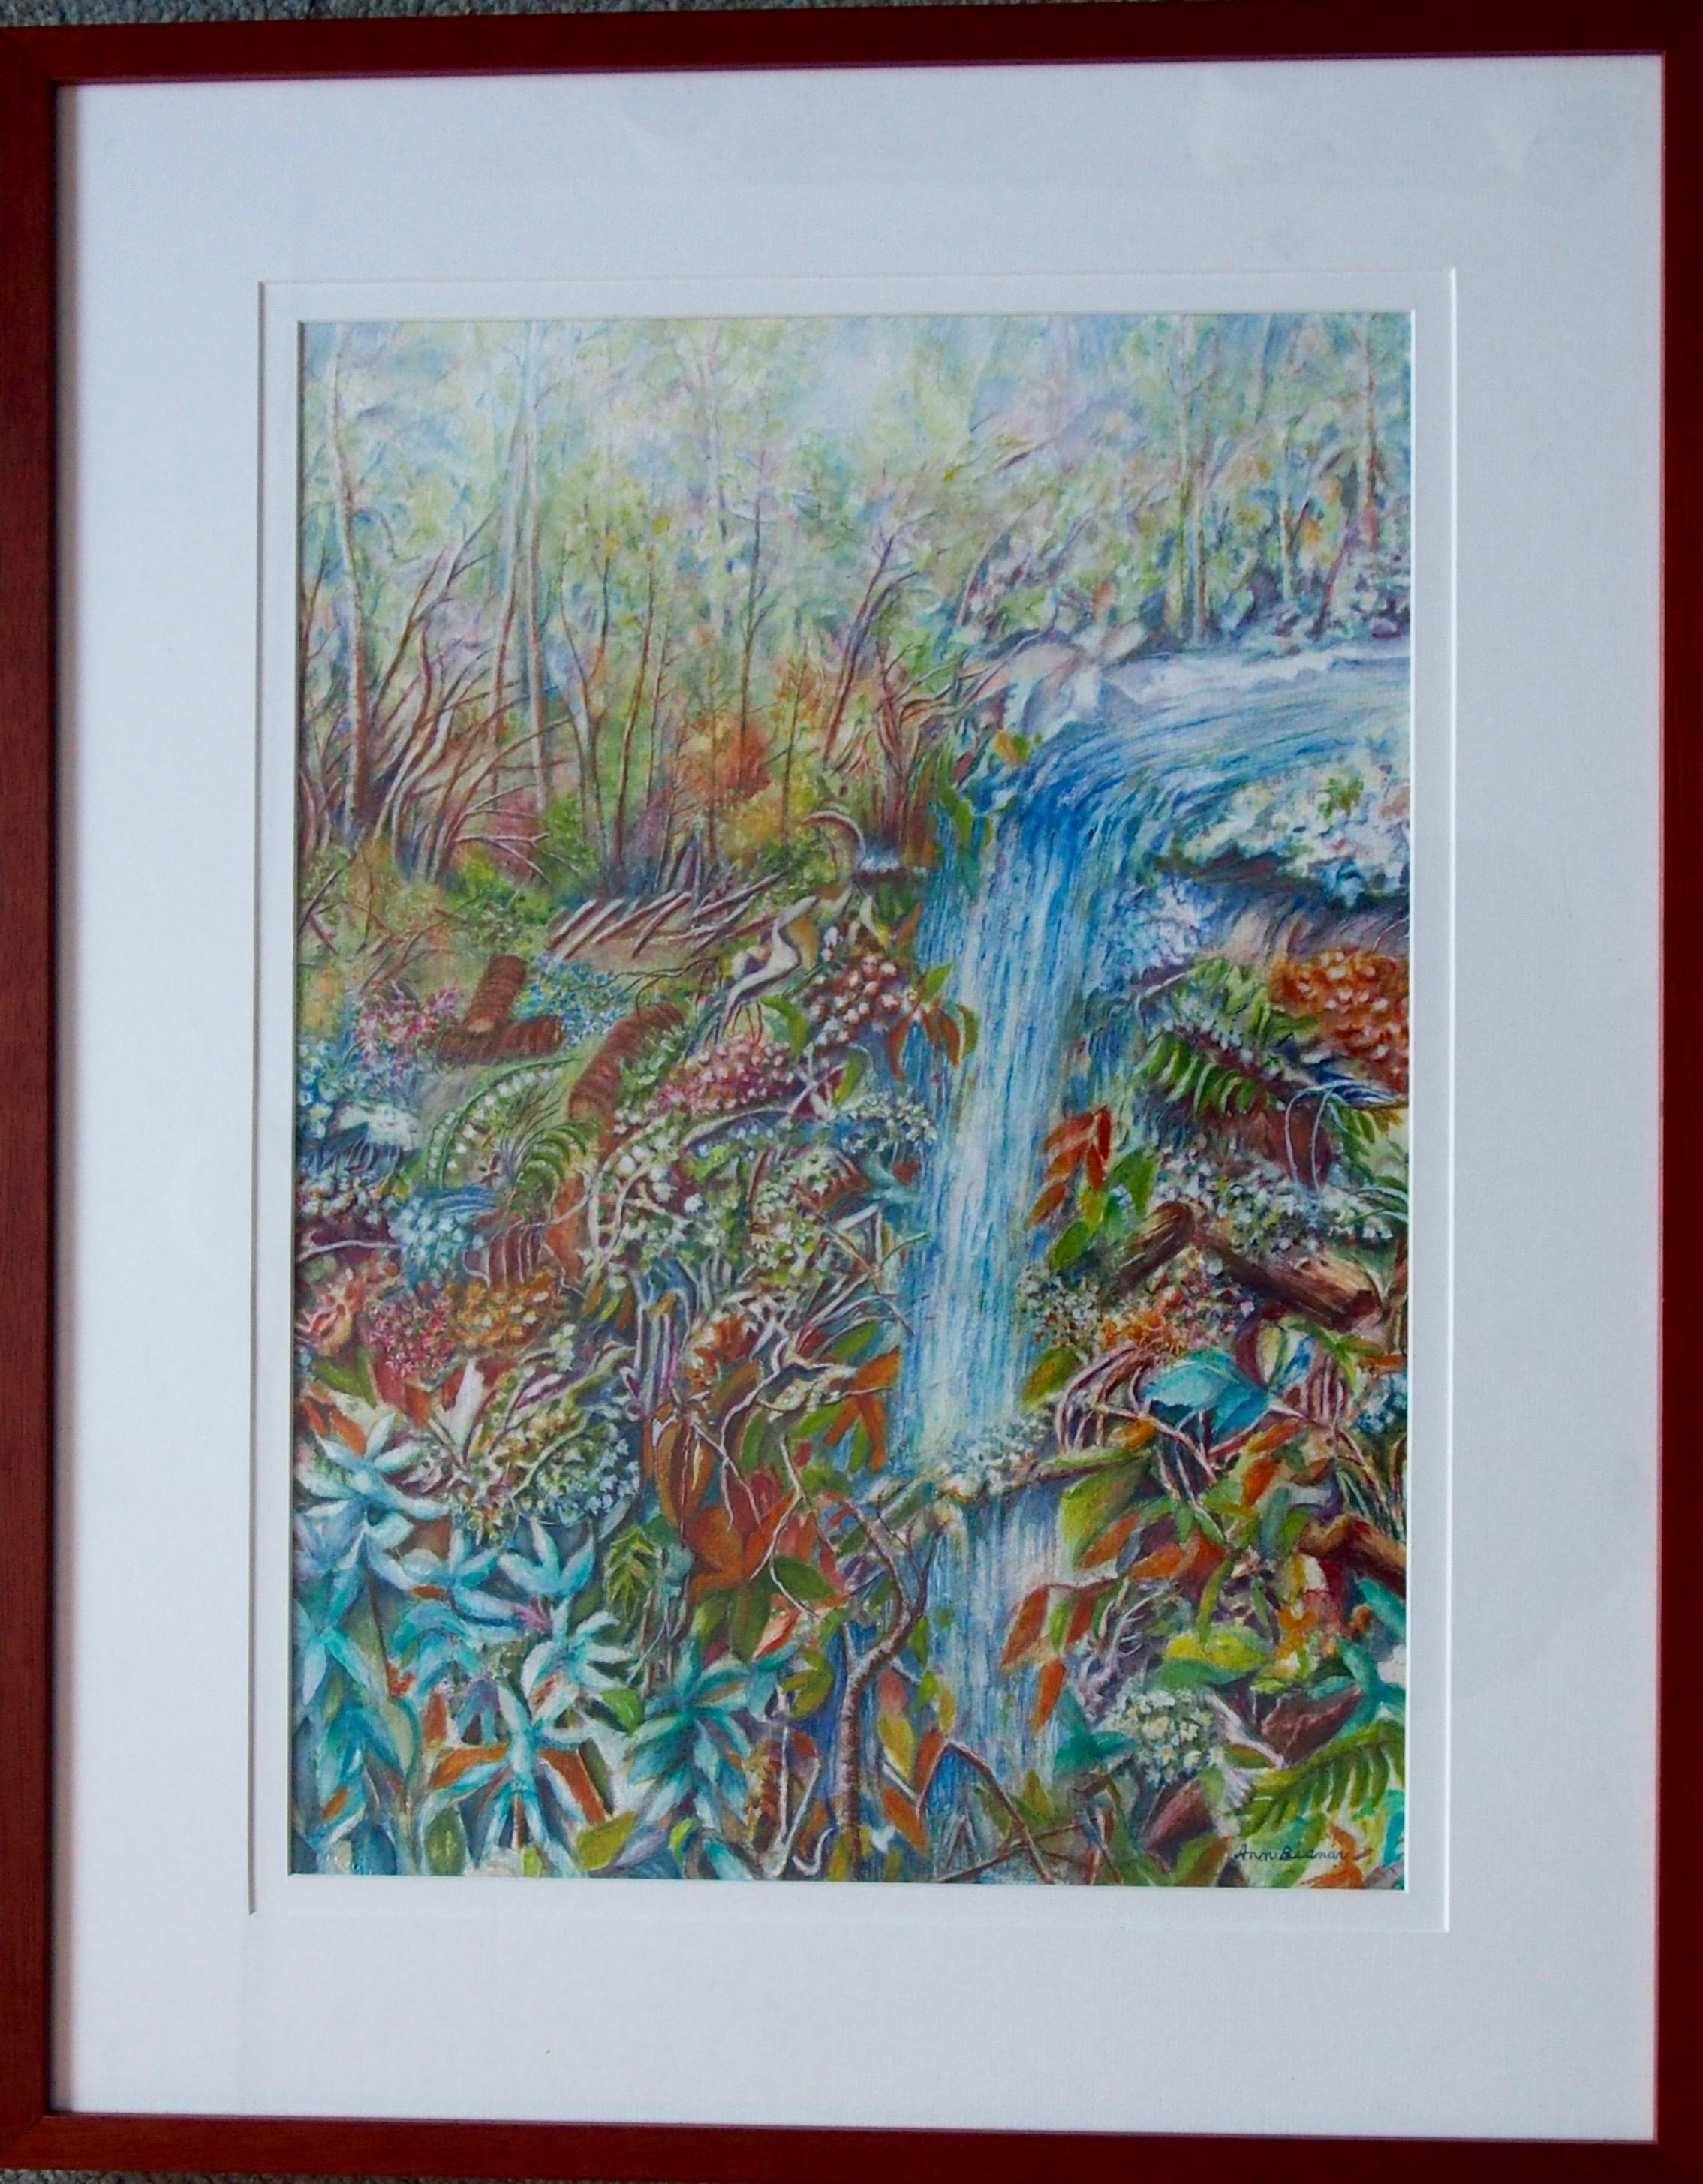 Waterfall Vision Dream